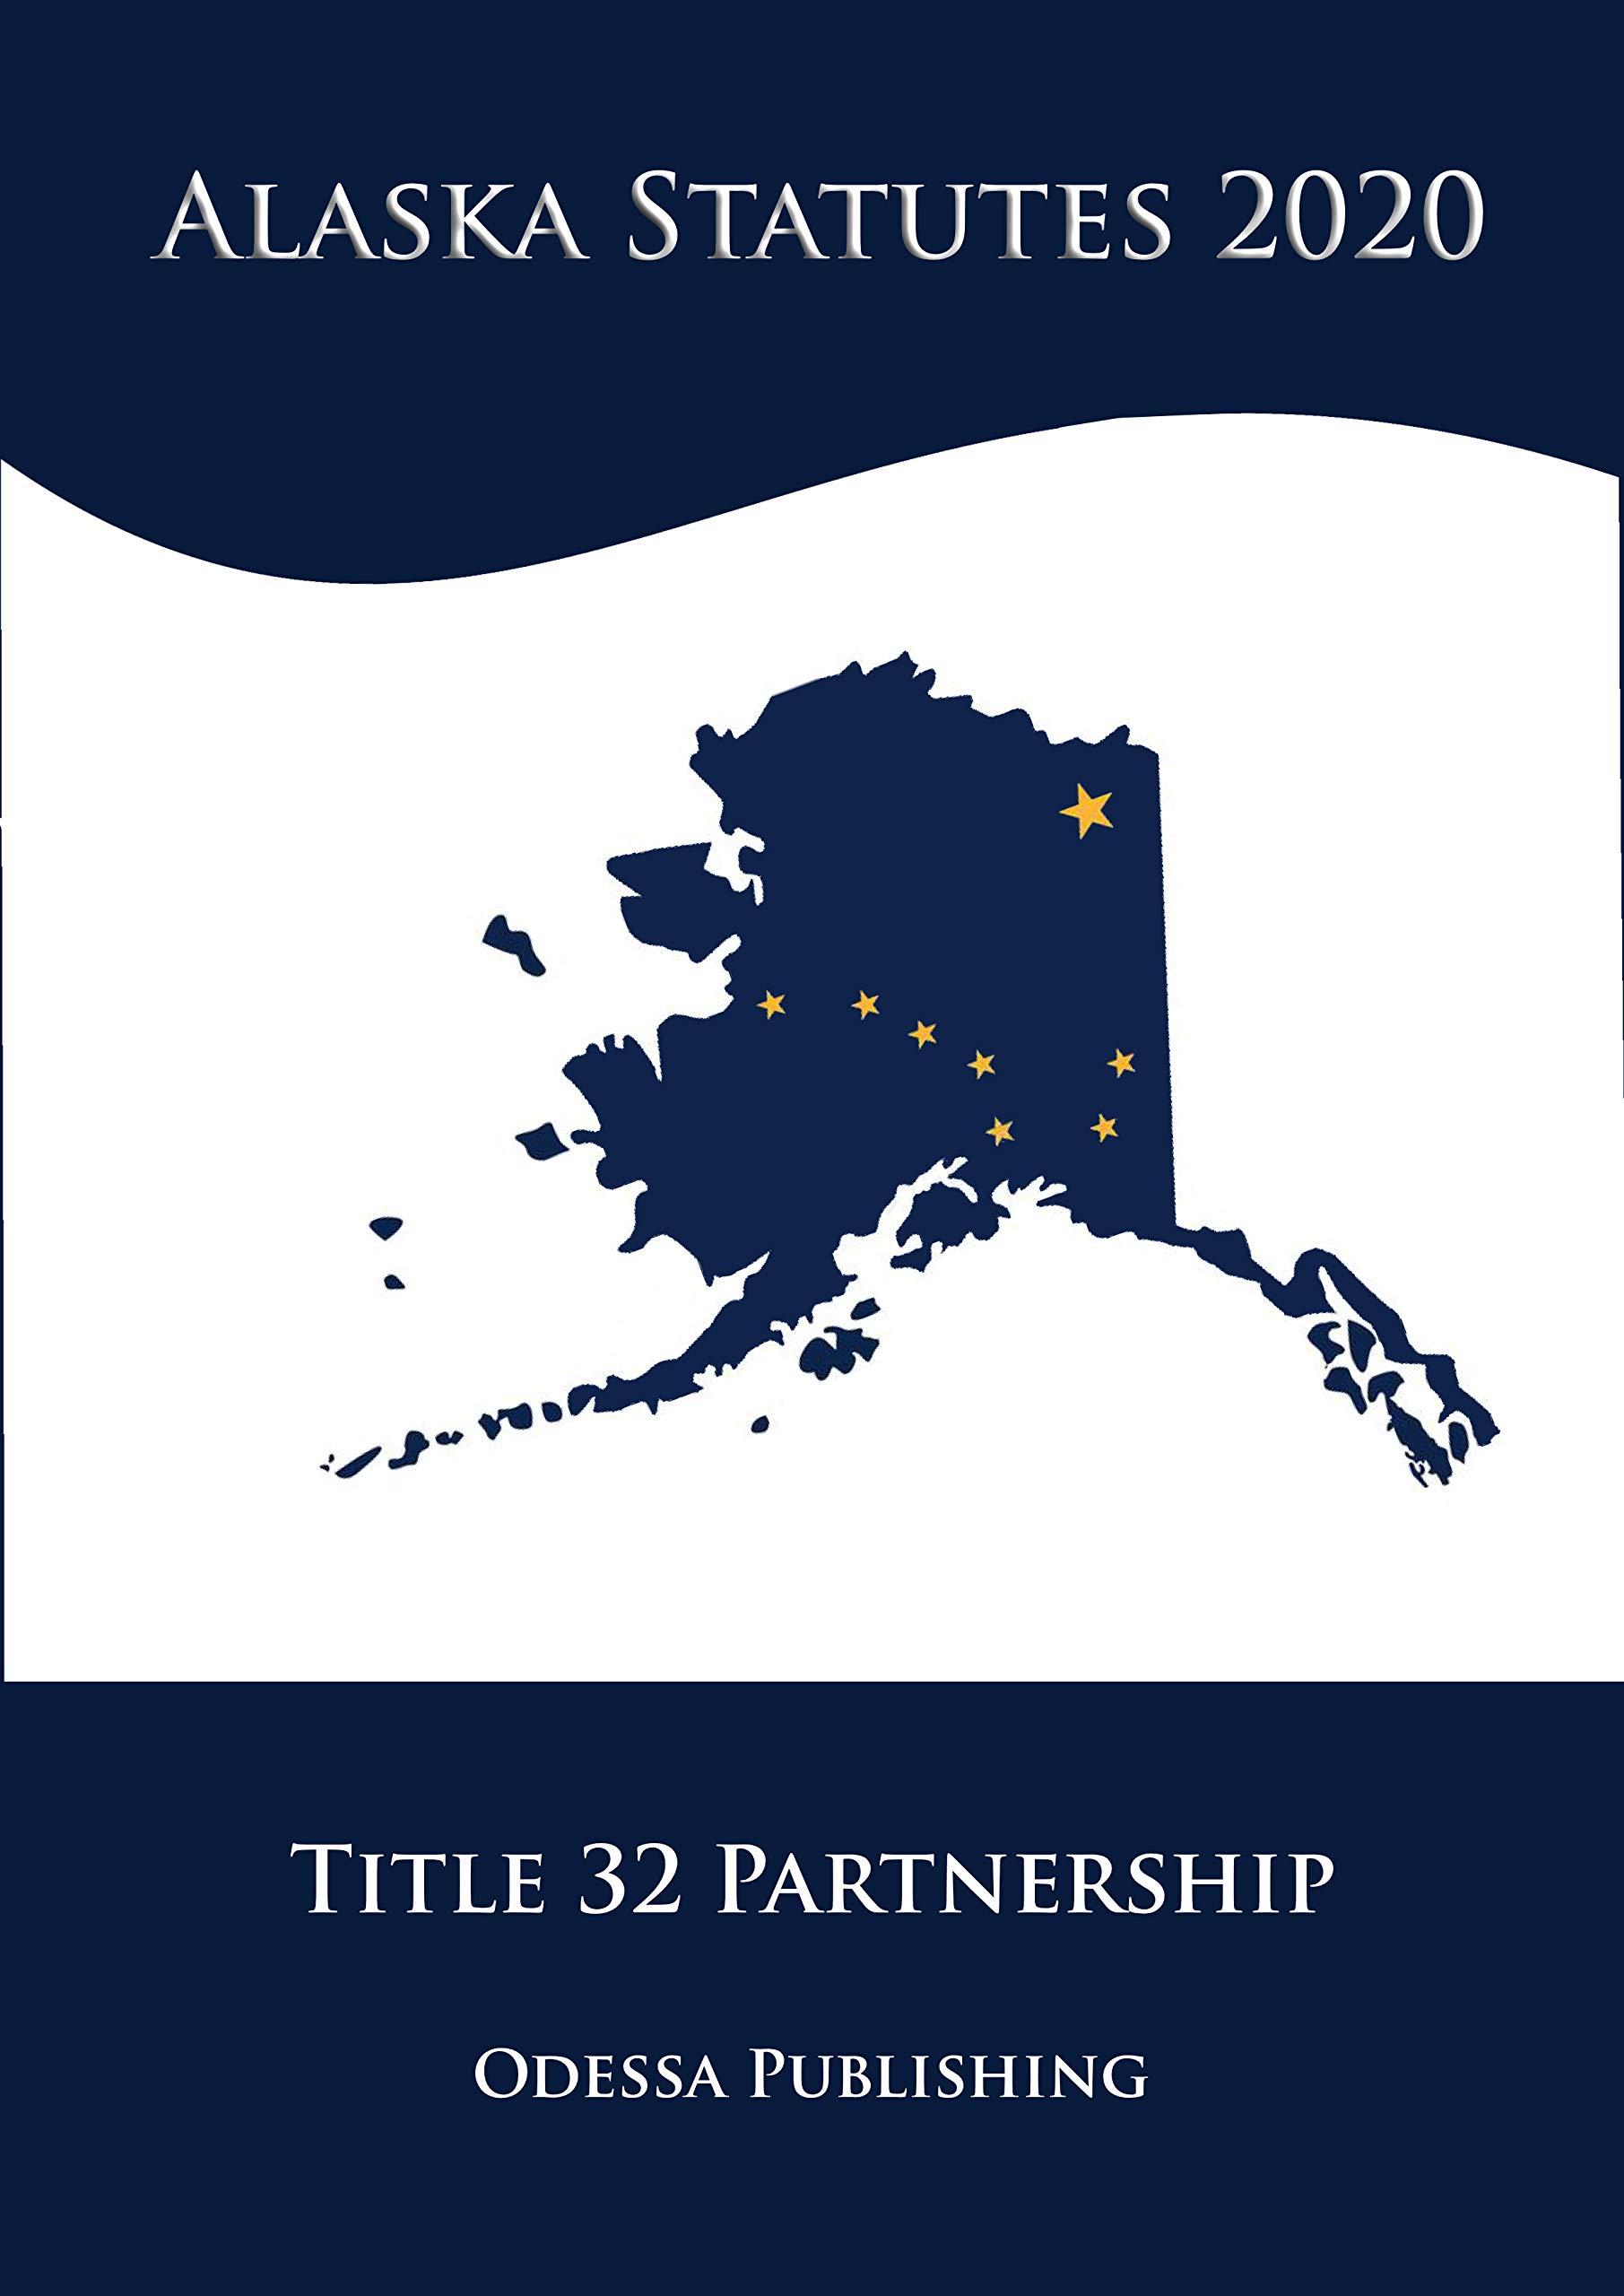 Alaska Statutes 2020 Title 32 Partnership